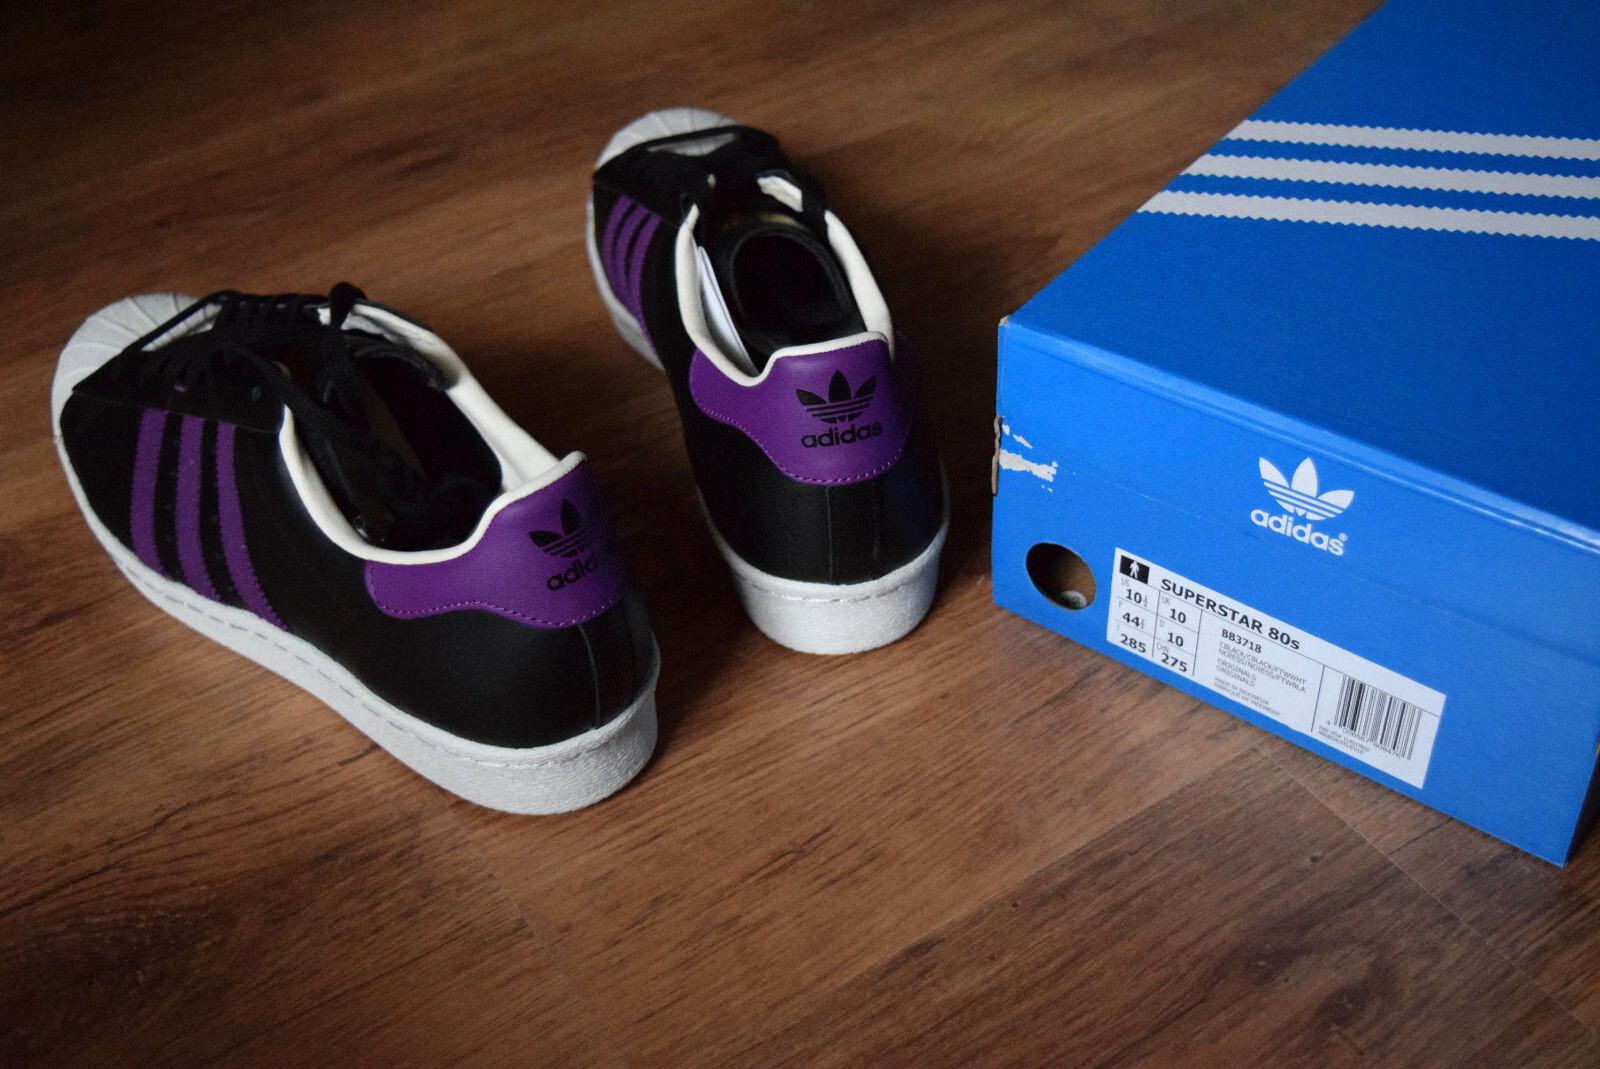 adidas Superstar 80s 41 42 42,5 43 44 smitH 45 BB3718 cAmPuS sTan smitH 44 forUm purple 2ab783